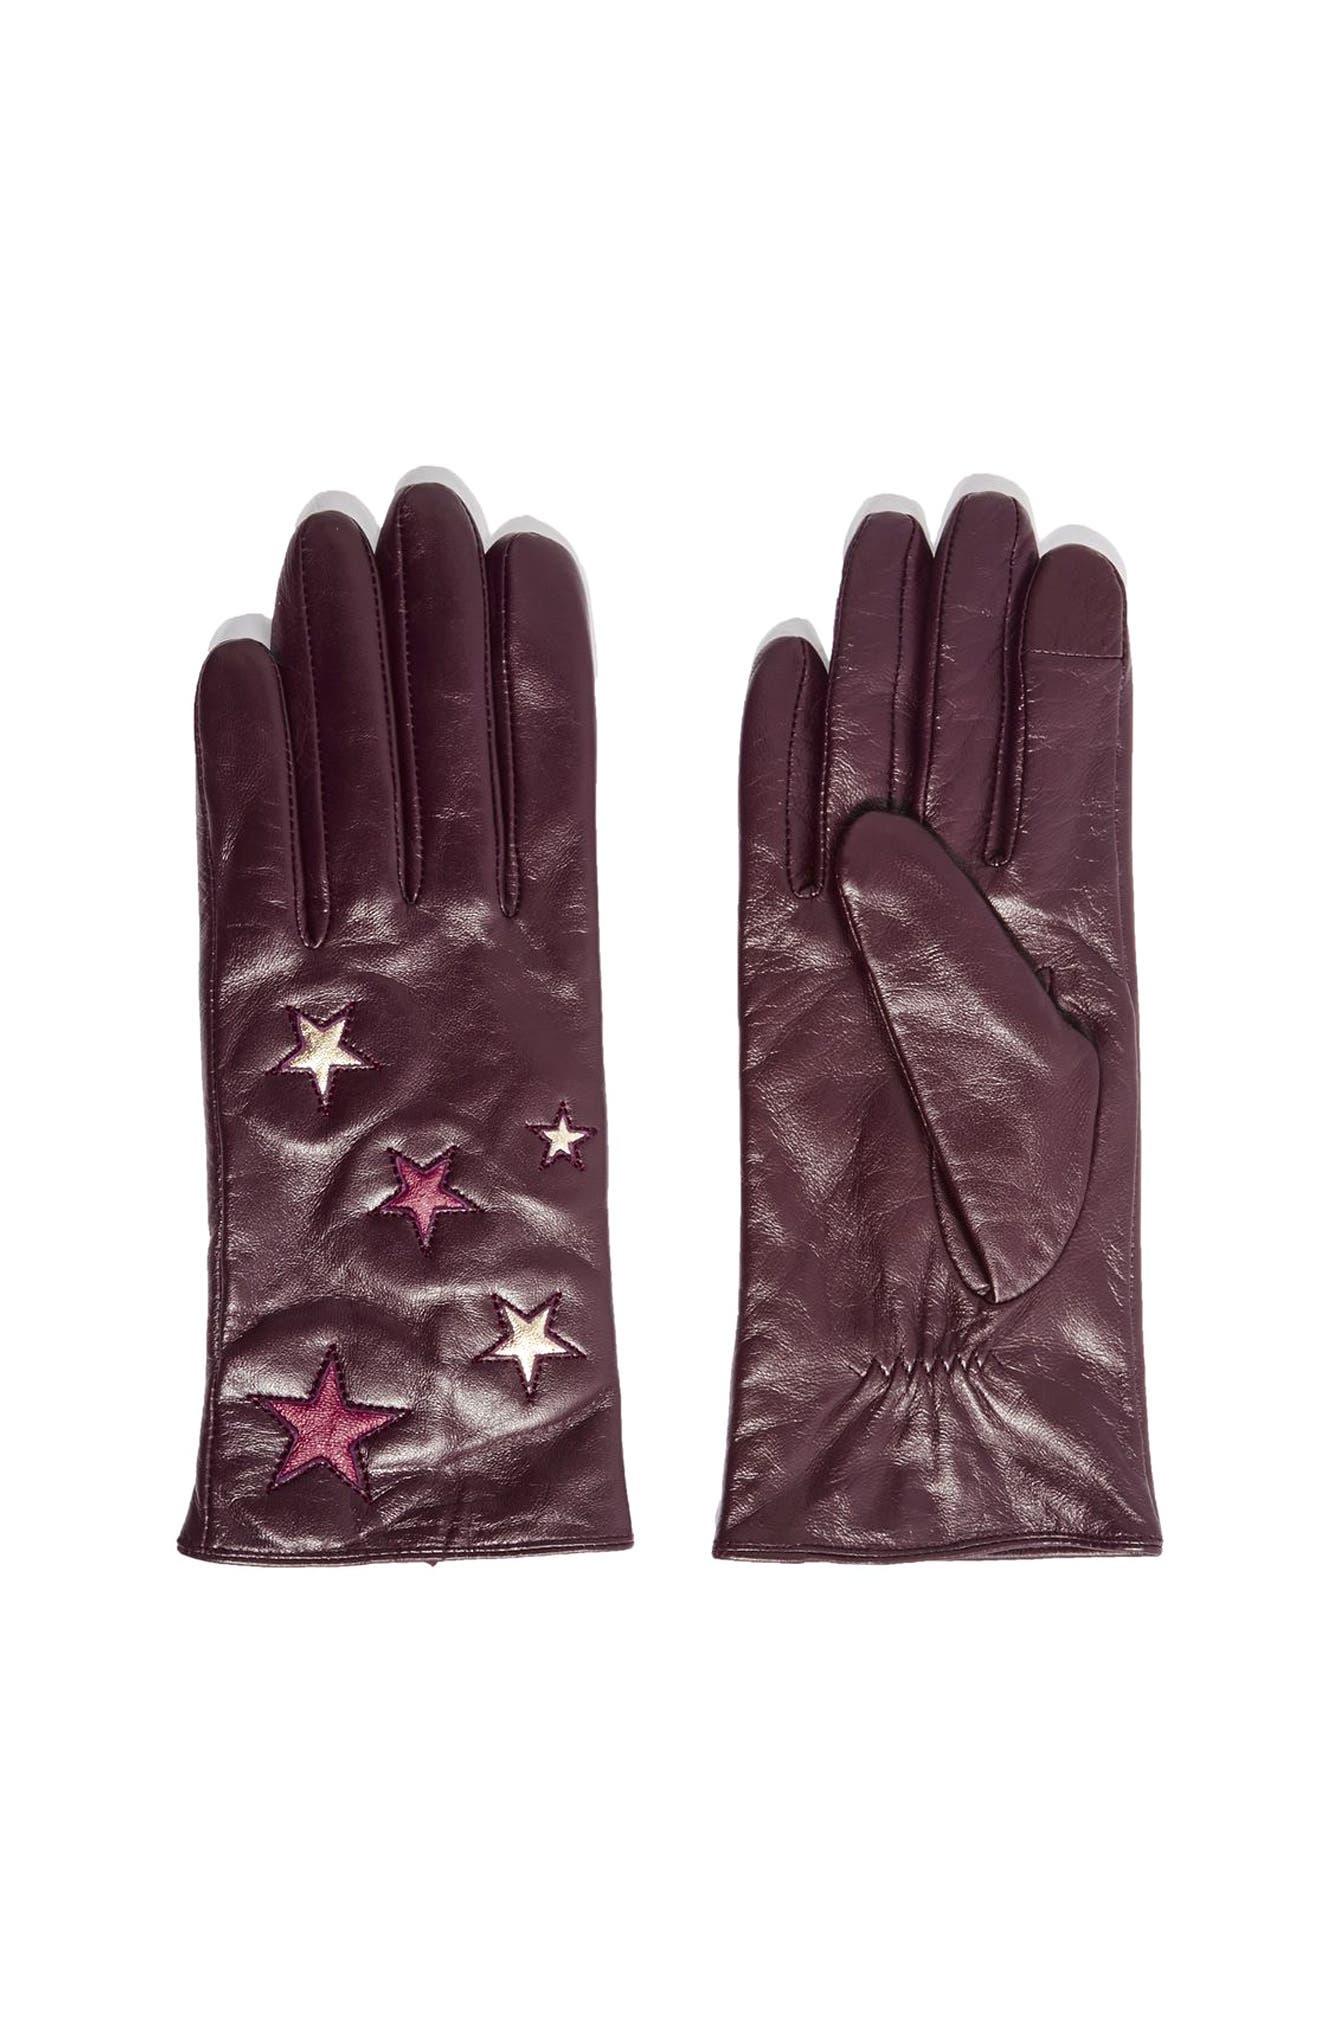 Topshop Metallic Star Leather Gloves